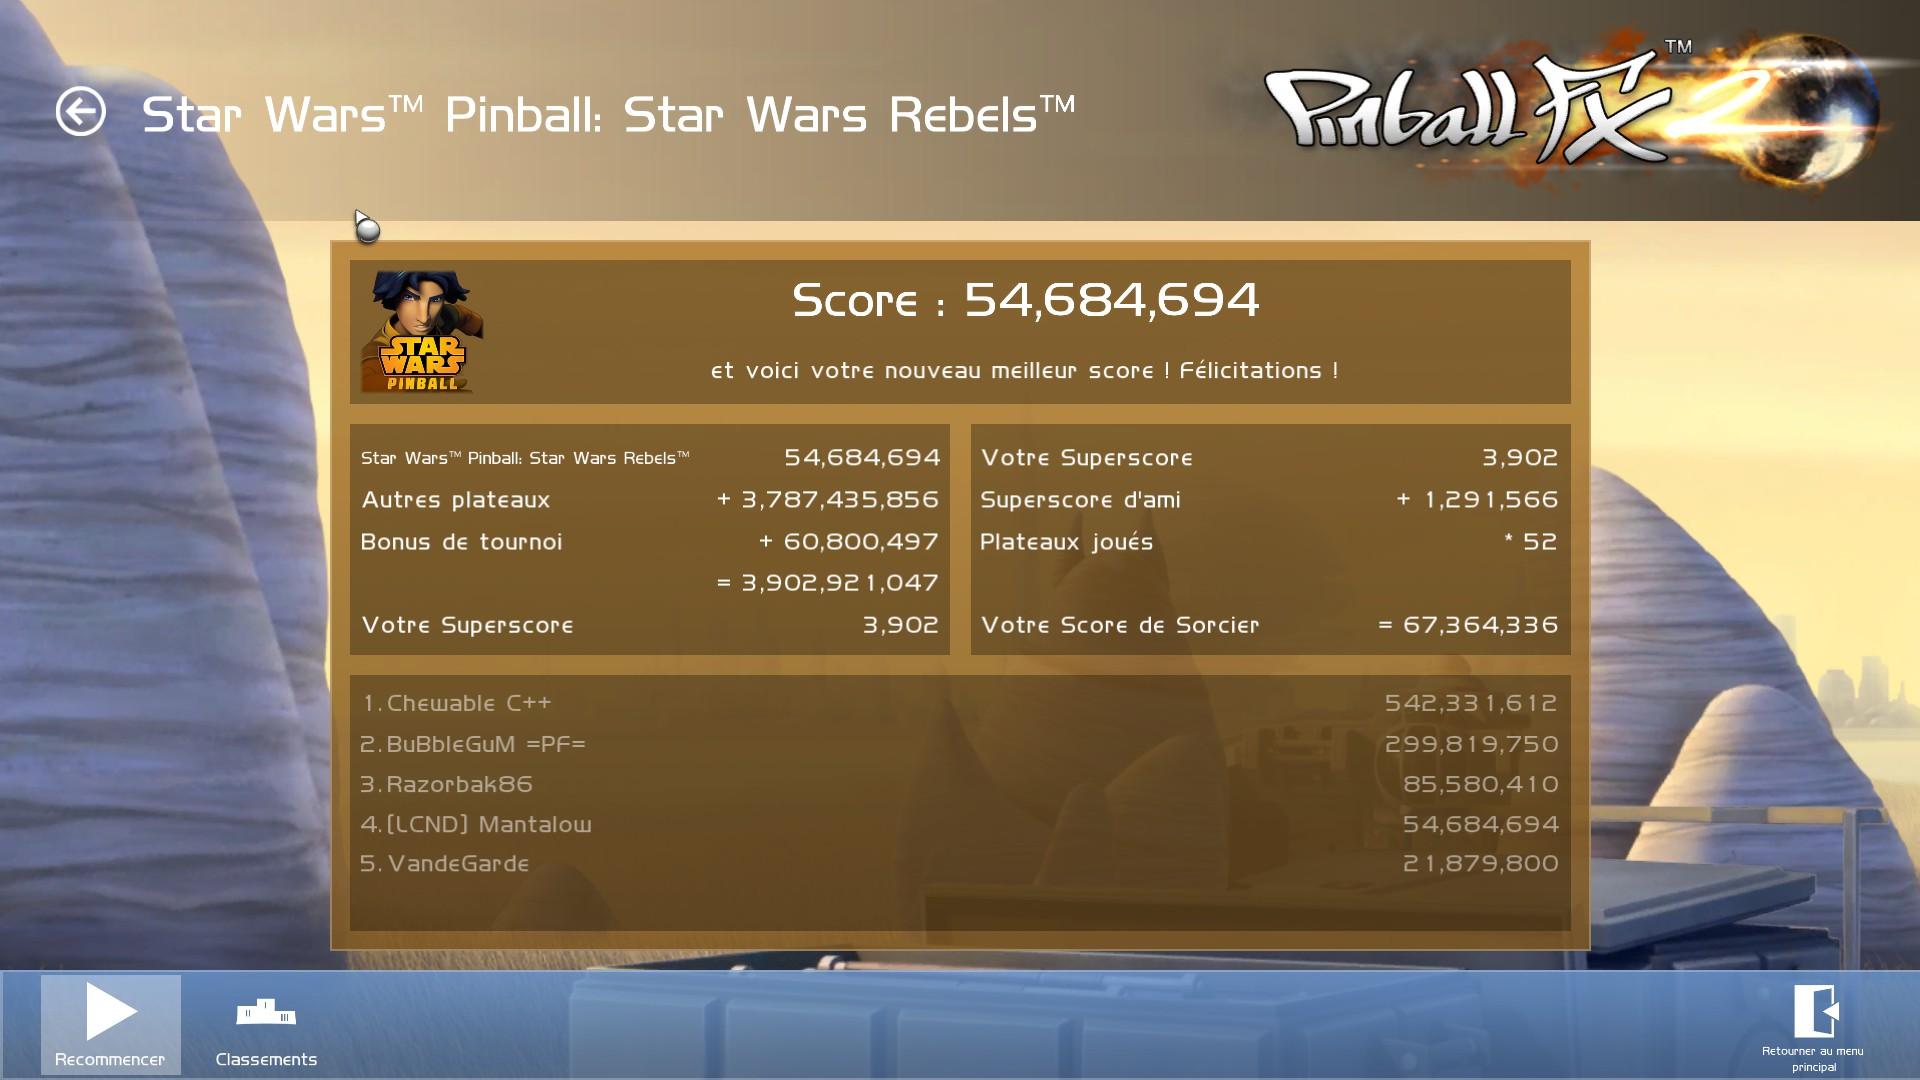 Mantalow: Pinball FX2: Star Wars Pinball: Star Wars Rebels (PC) 54,684,694 points on 2015-05-02 02:16:46